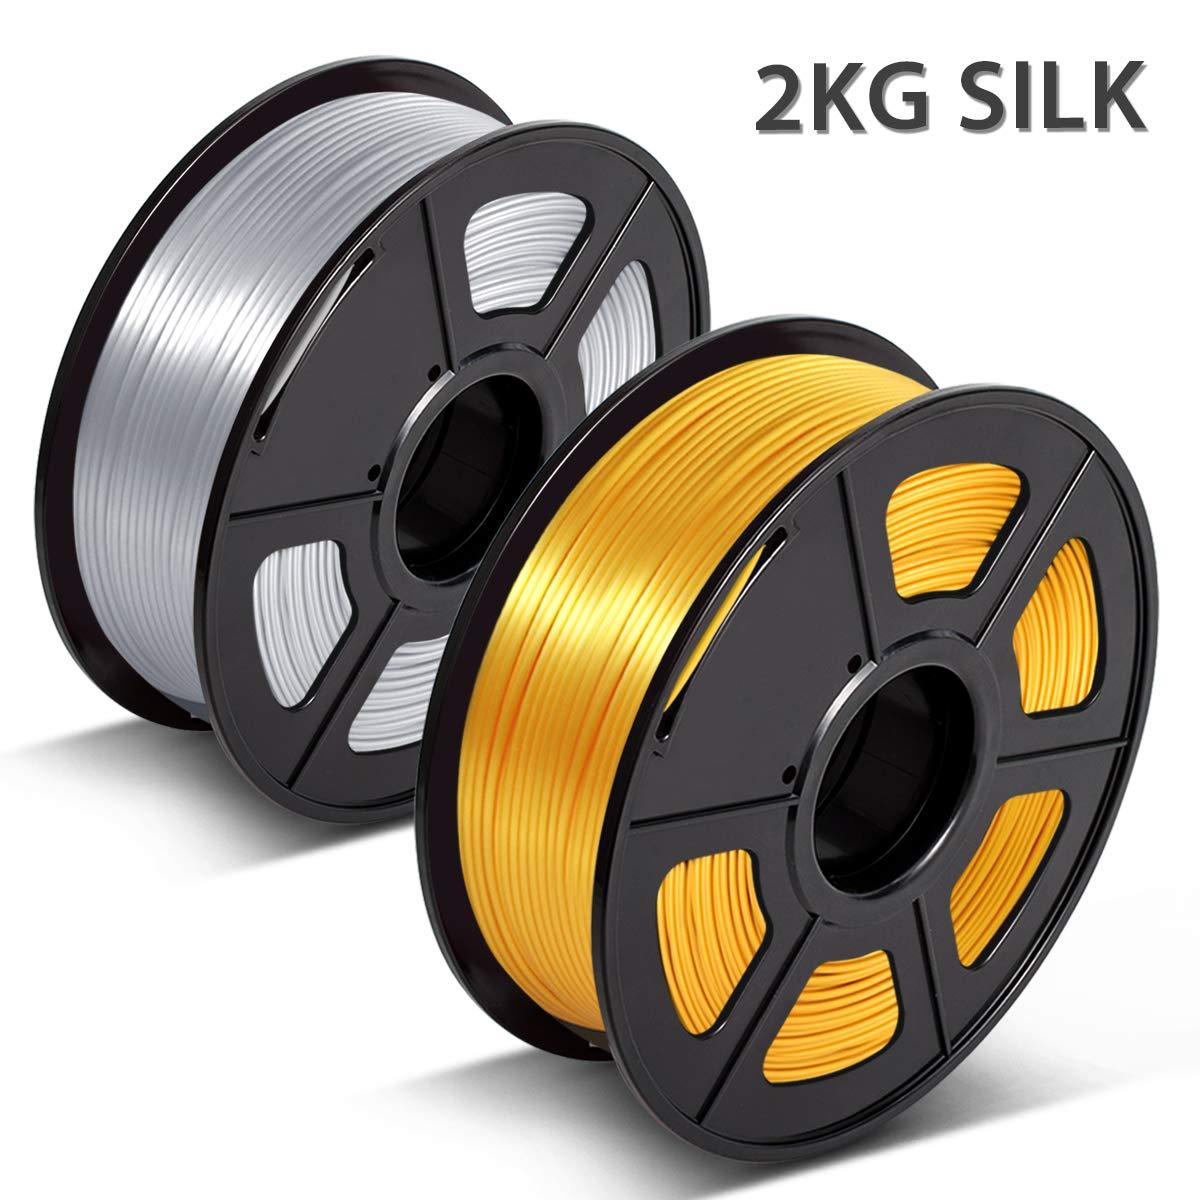 3D Filament Silk PLA 1.75mm,3D Warhorse Shiny Silk PLA Filament for 3D Printer,Silk Filament Red Copper+LightGold,2 0.02 mm,Printing Smooth // KG Spool,Dimensional Accuracy